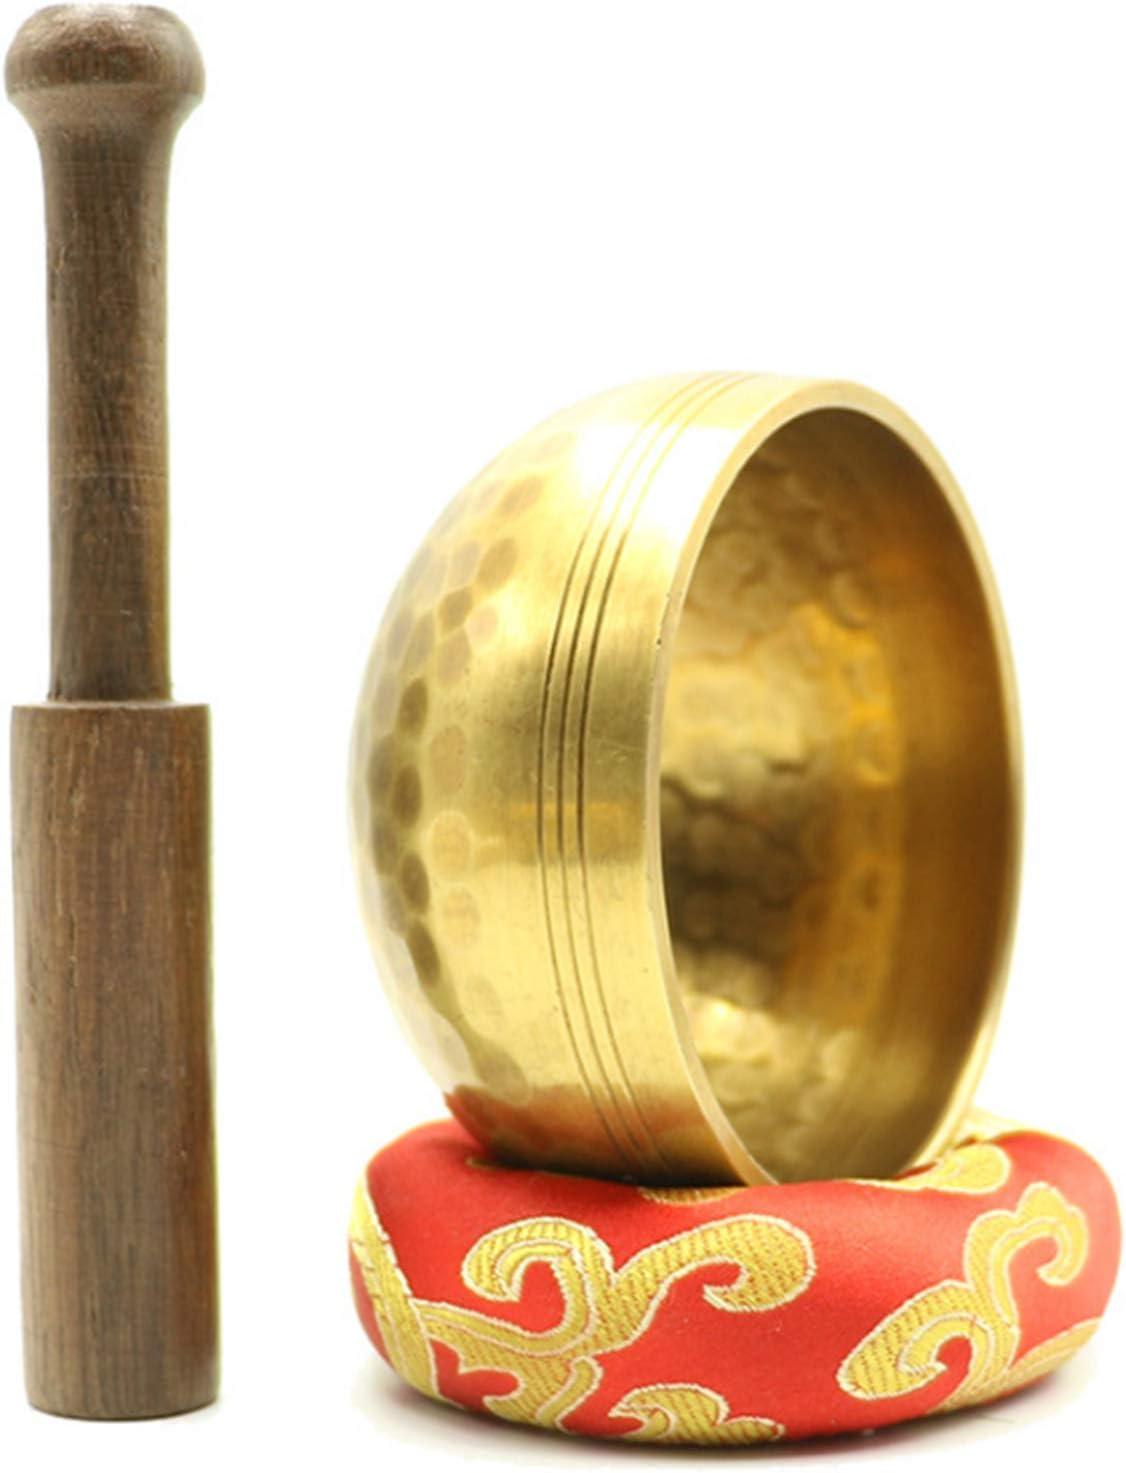 Wsaman Chakra Tibetan Musical Art At the price of surprise Max 79% OFF Instrument Bowl Handma